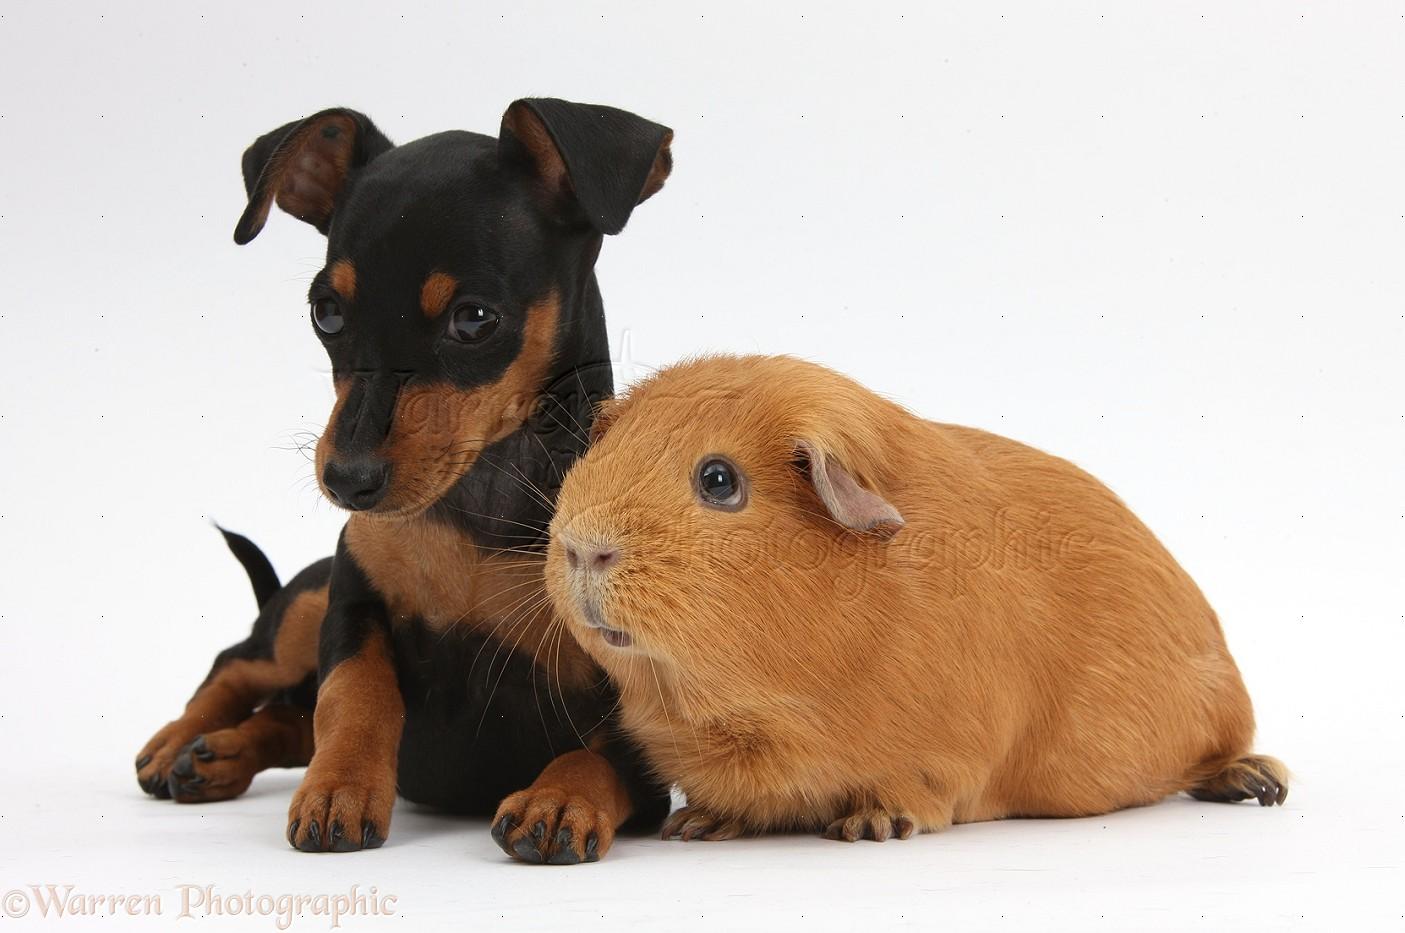 Pets Miniature Pinscher Puppy And Guinea Pig Photo Wp37373